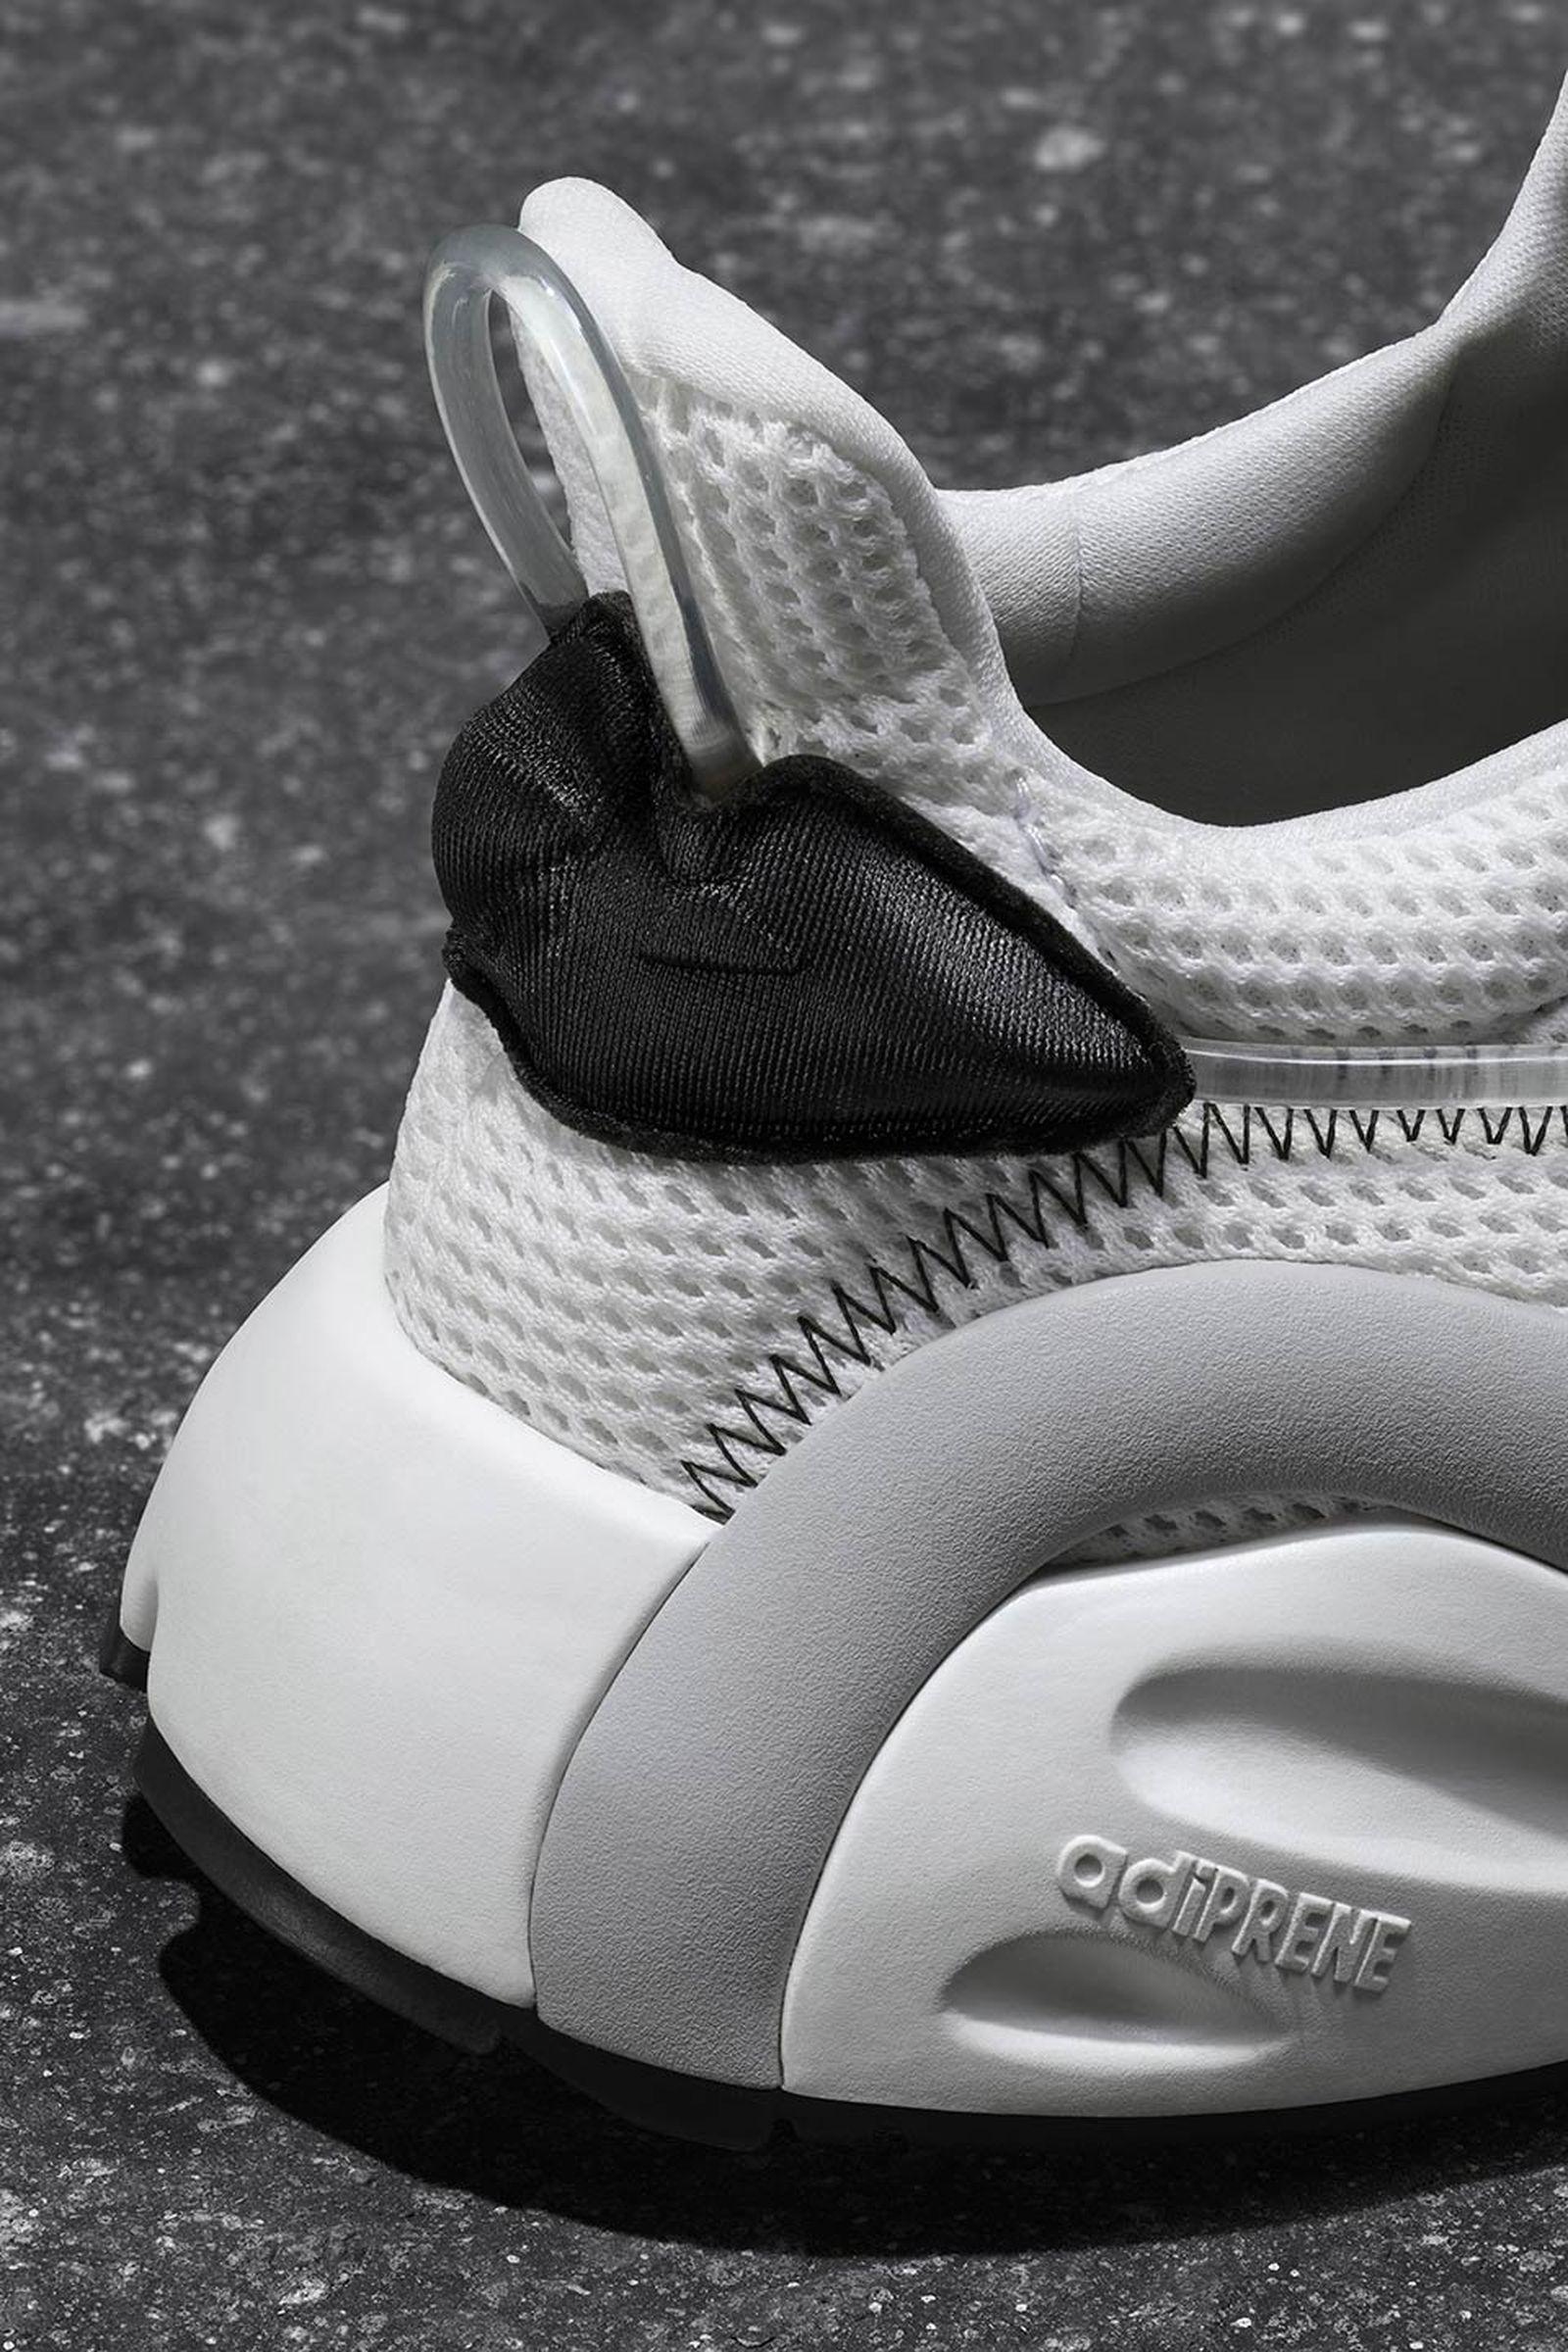 adidas originals lexicon future release date price info official campaign